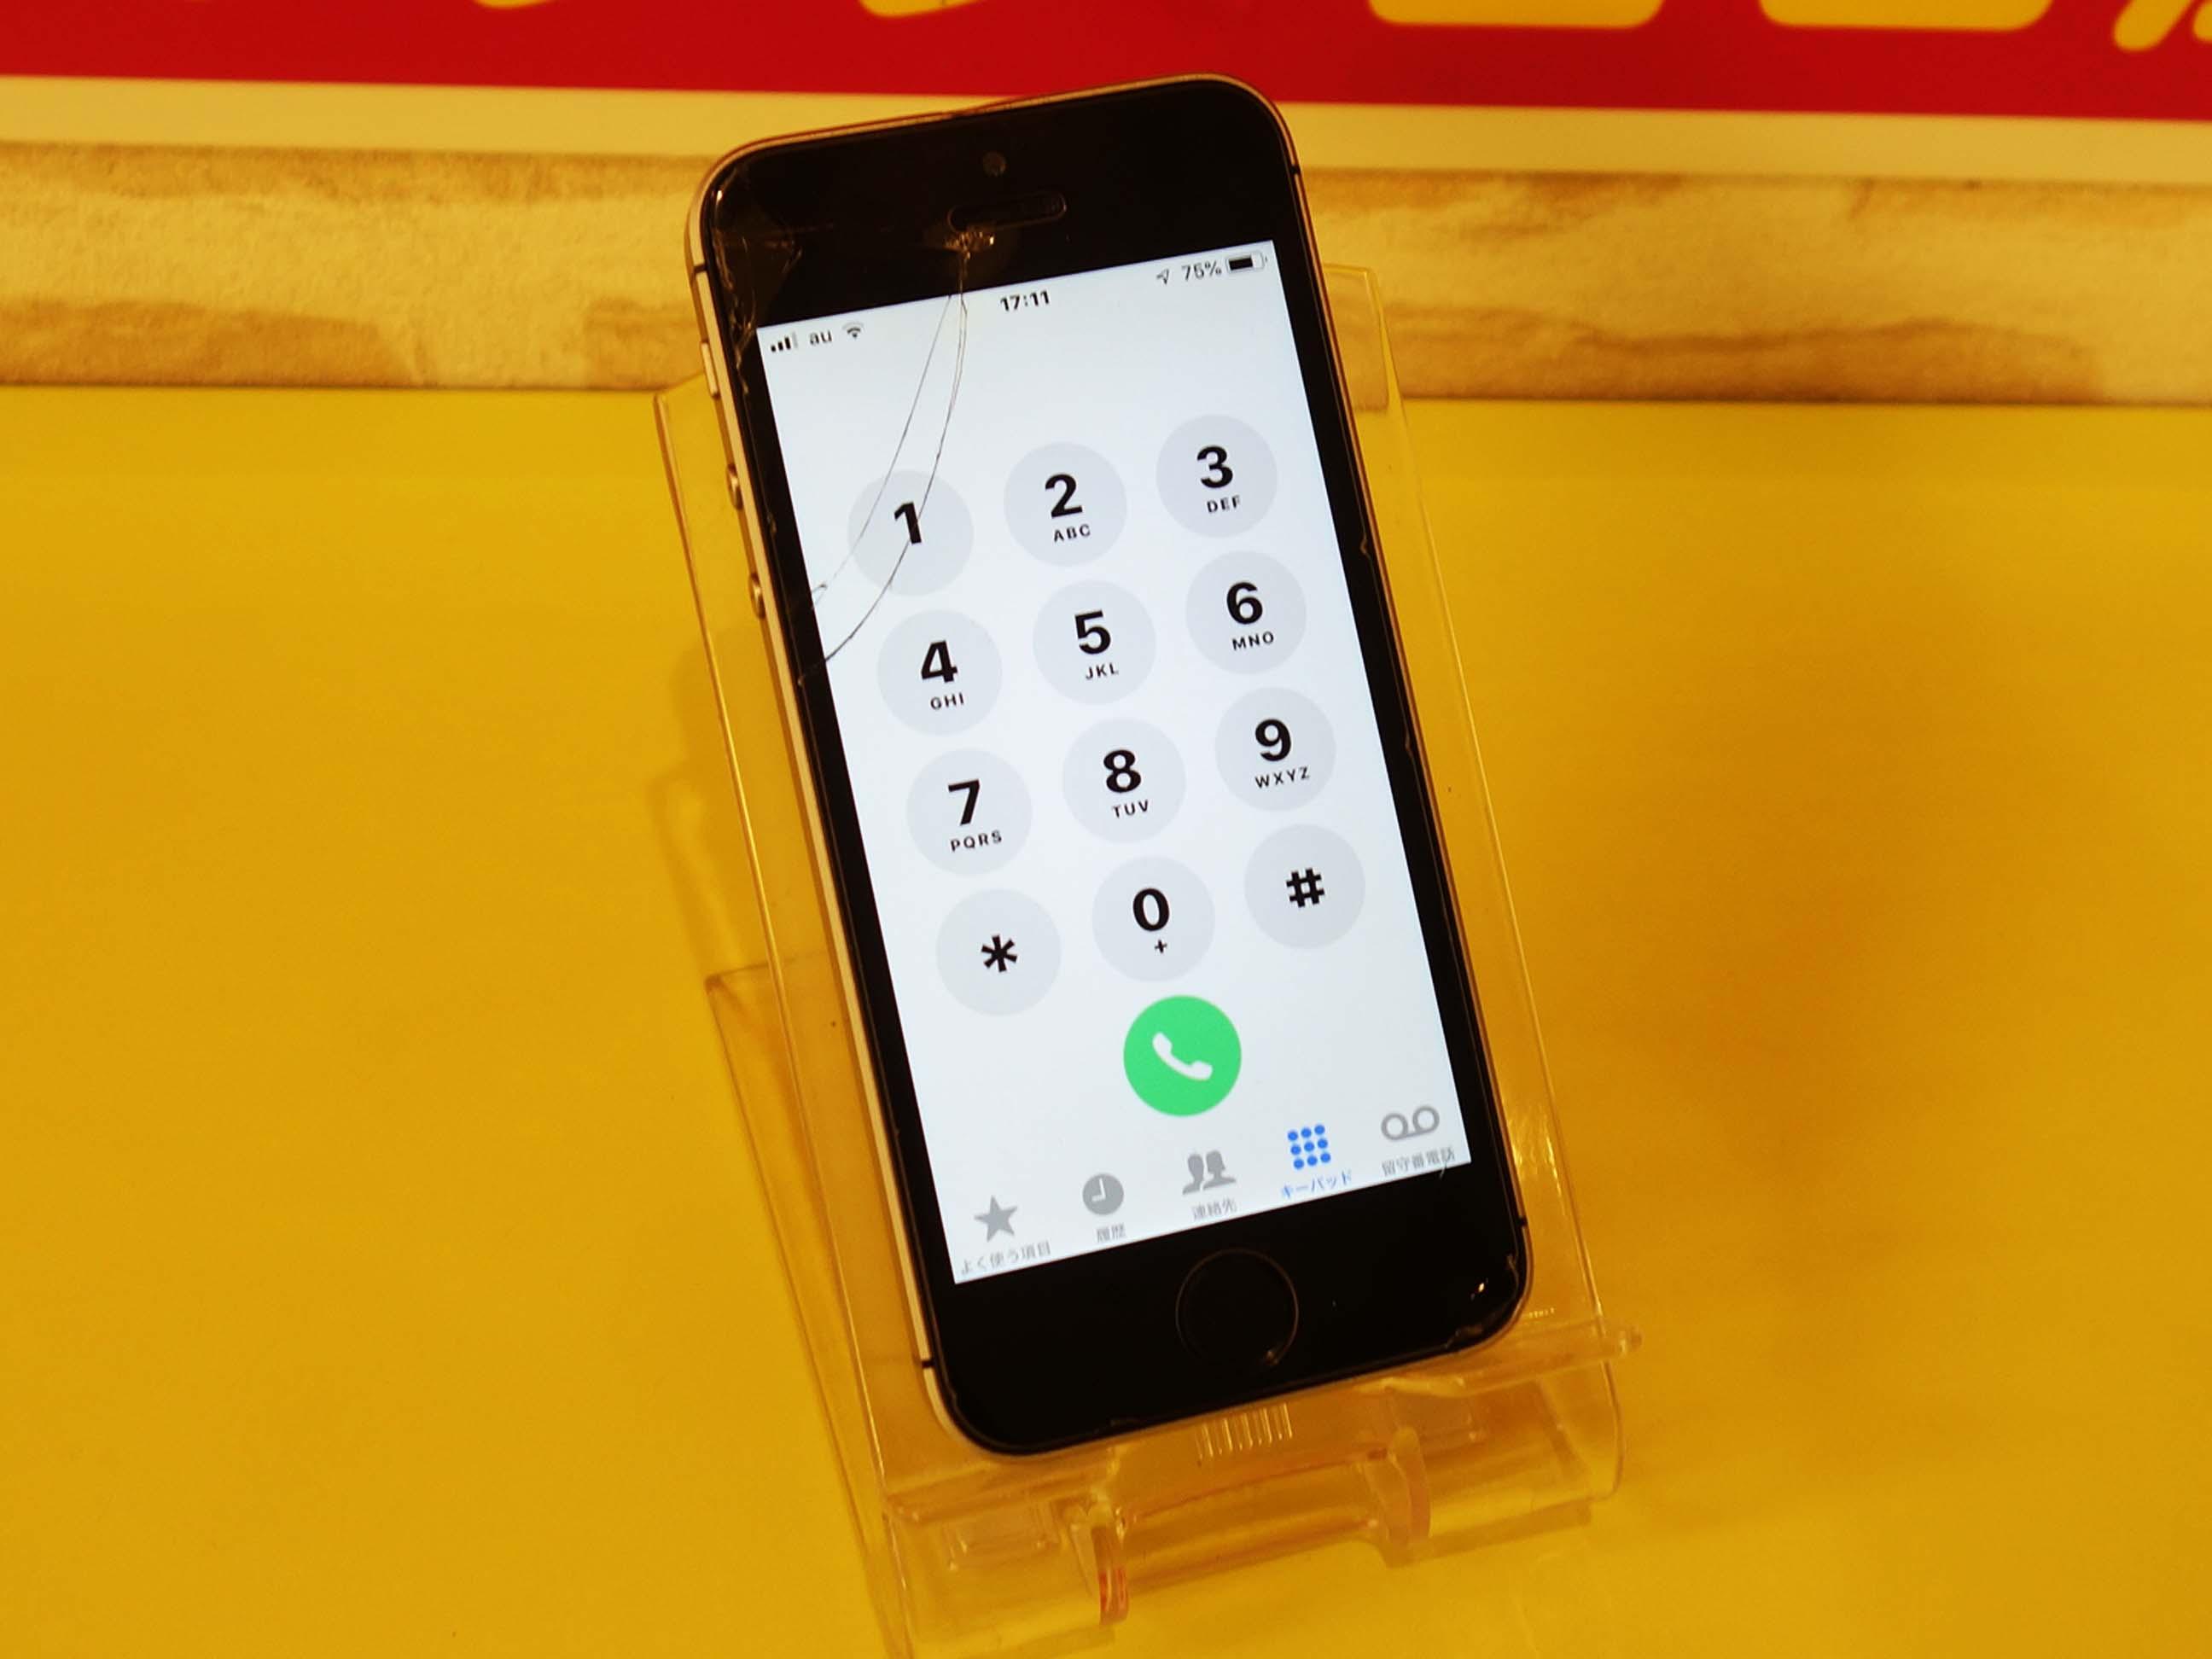 iPhoneSEのガラスとバッテリー交換修理で名古屋市からご来店!アイフォン修理のクイック